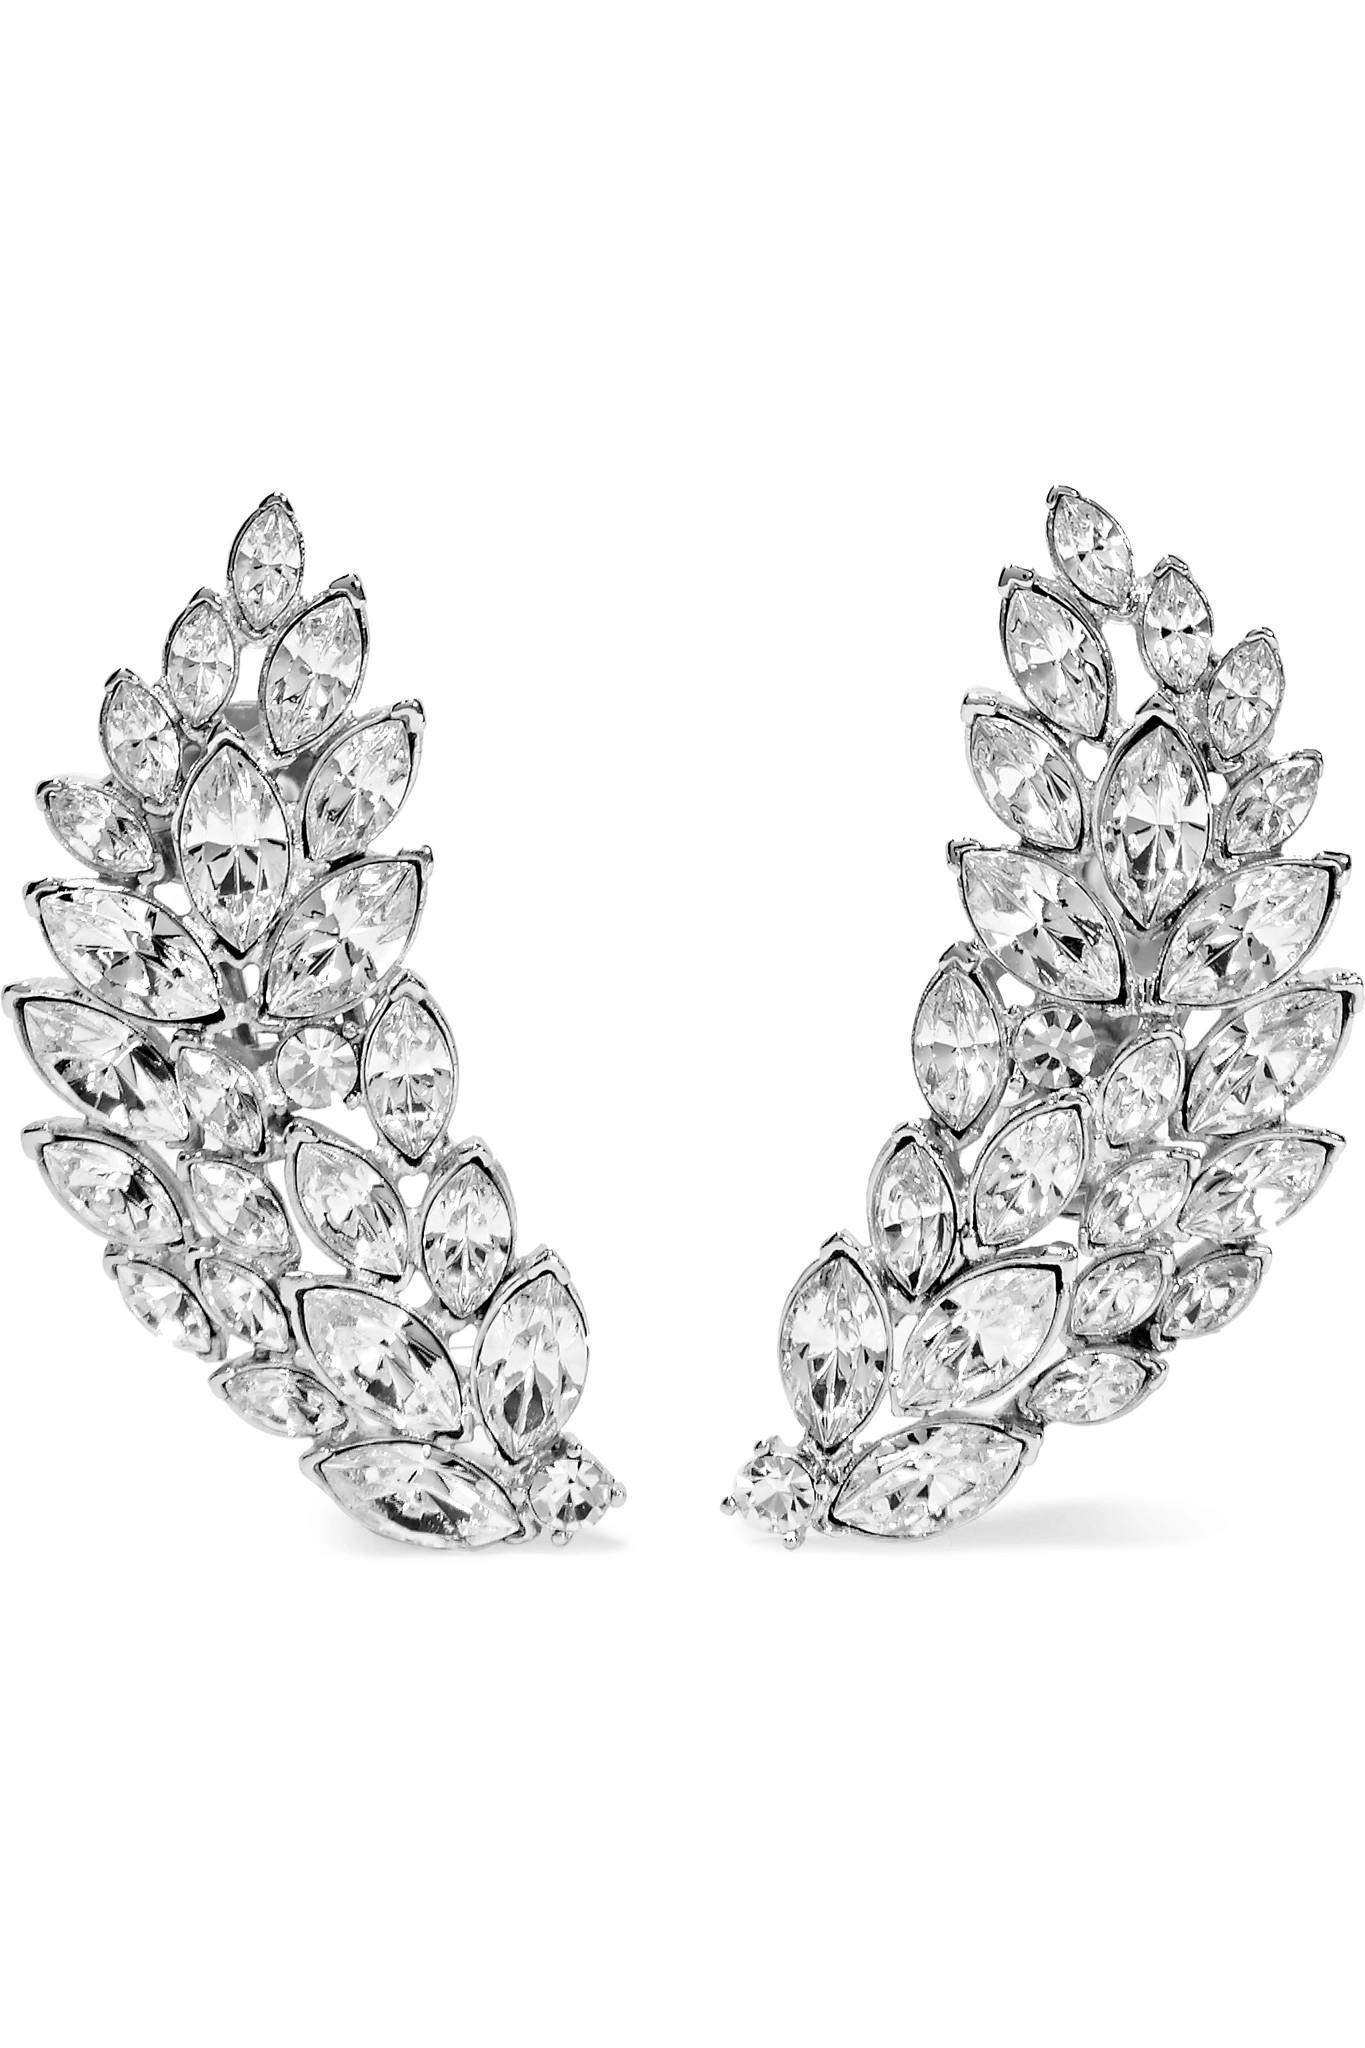 Kenneth Jay Lane Silver Crystal Chandelier Clip Earrings Silver/crystal xZiUXwwMK